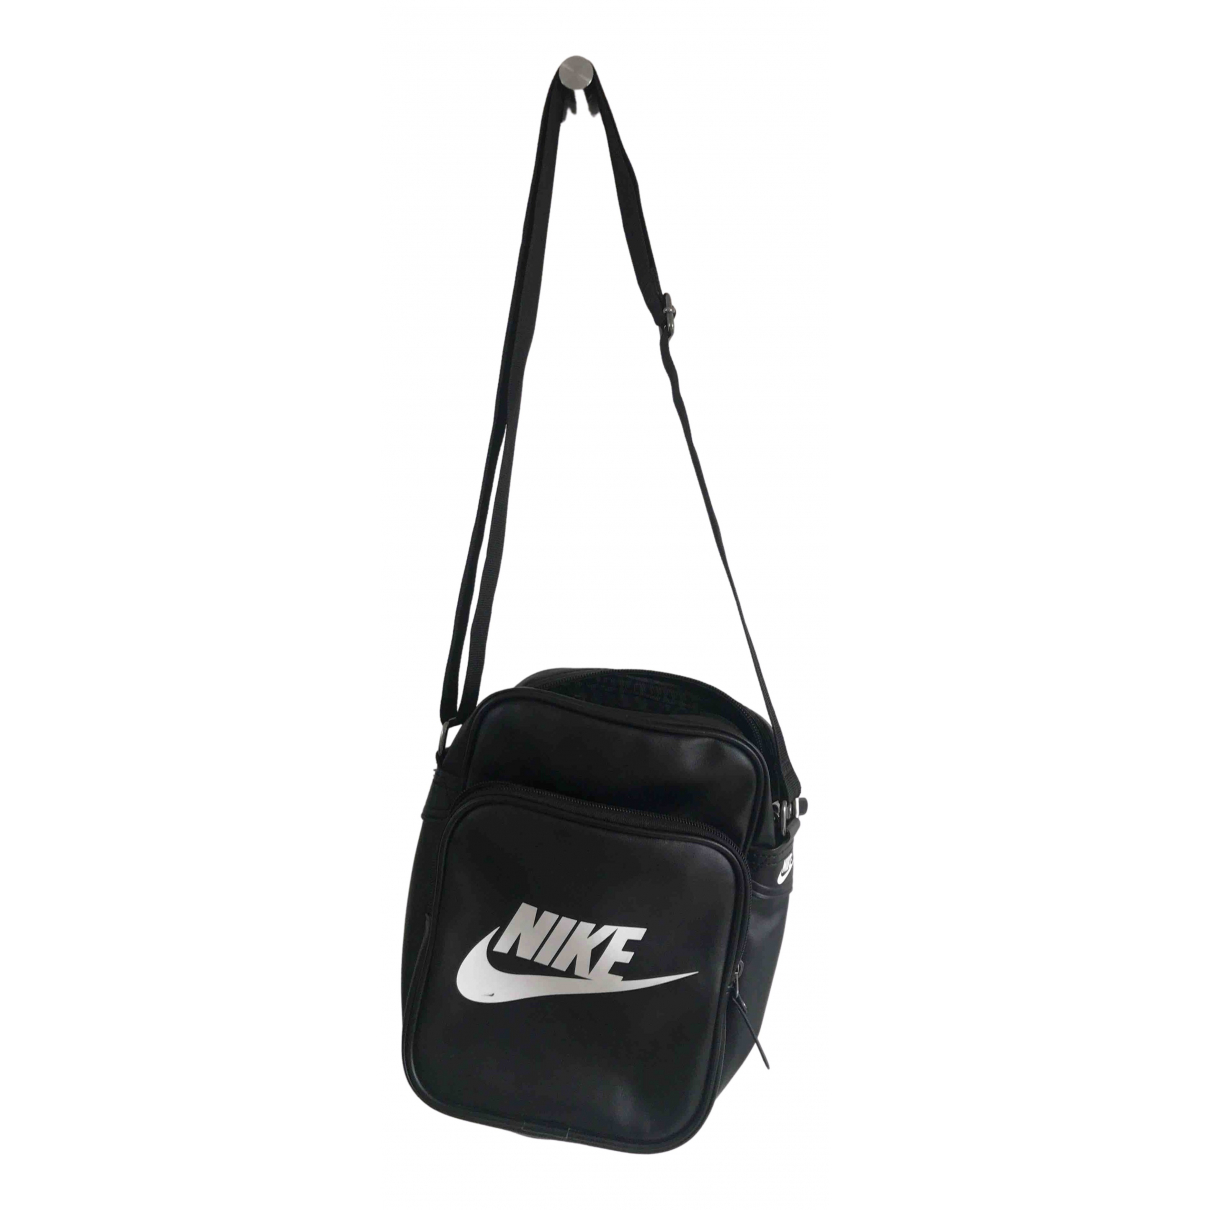 Nike \N Black handbag for Women \N